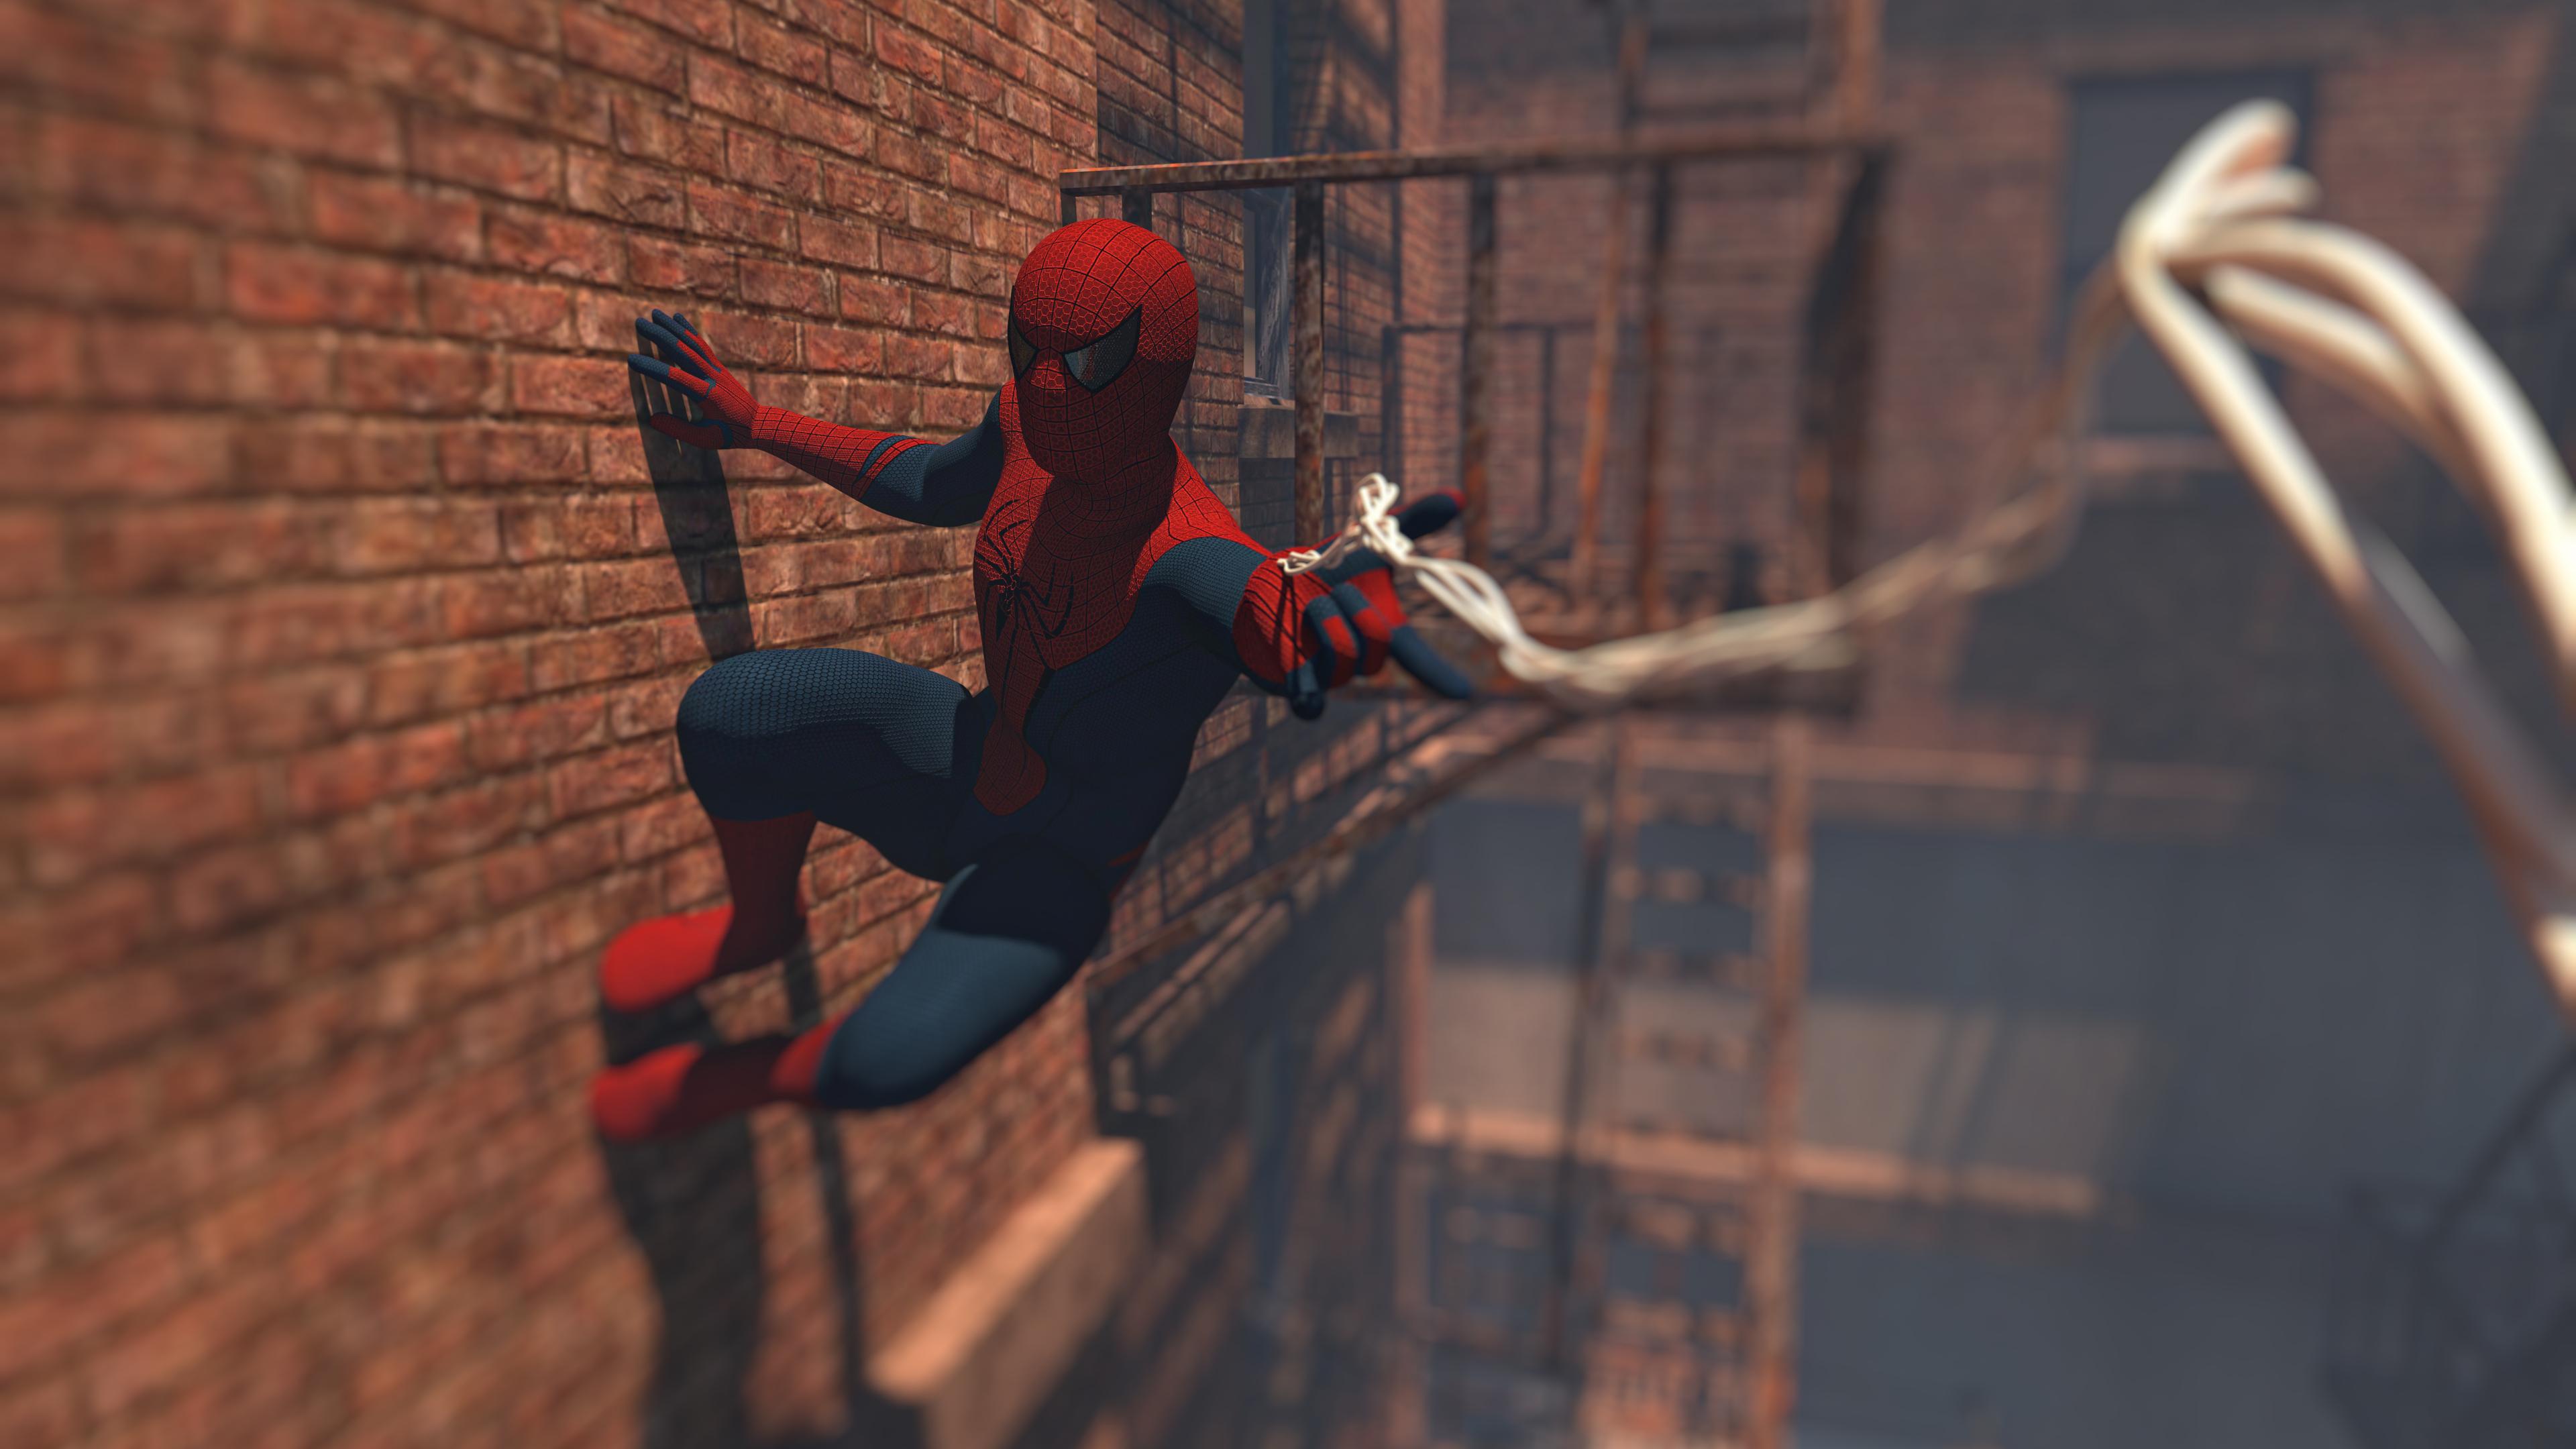 spiderman 5k digital art 1536522549 - Spiderman 5k Digital Art - superheroes wallpapers, spiderman wallpapers, hd-wallpapers, digital art wallpapers, deviantart wallpapers, artist wallpapers, 5k wallpapers, 4k-wallpapers